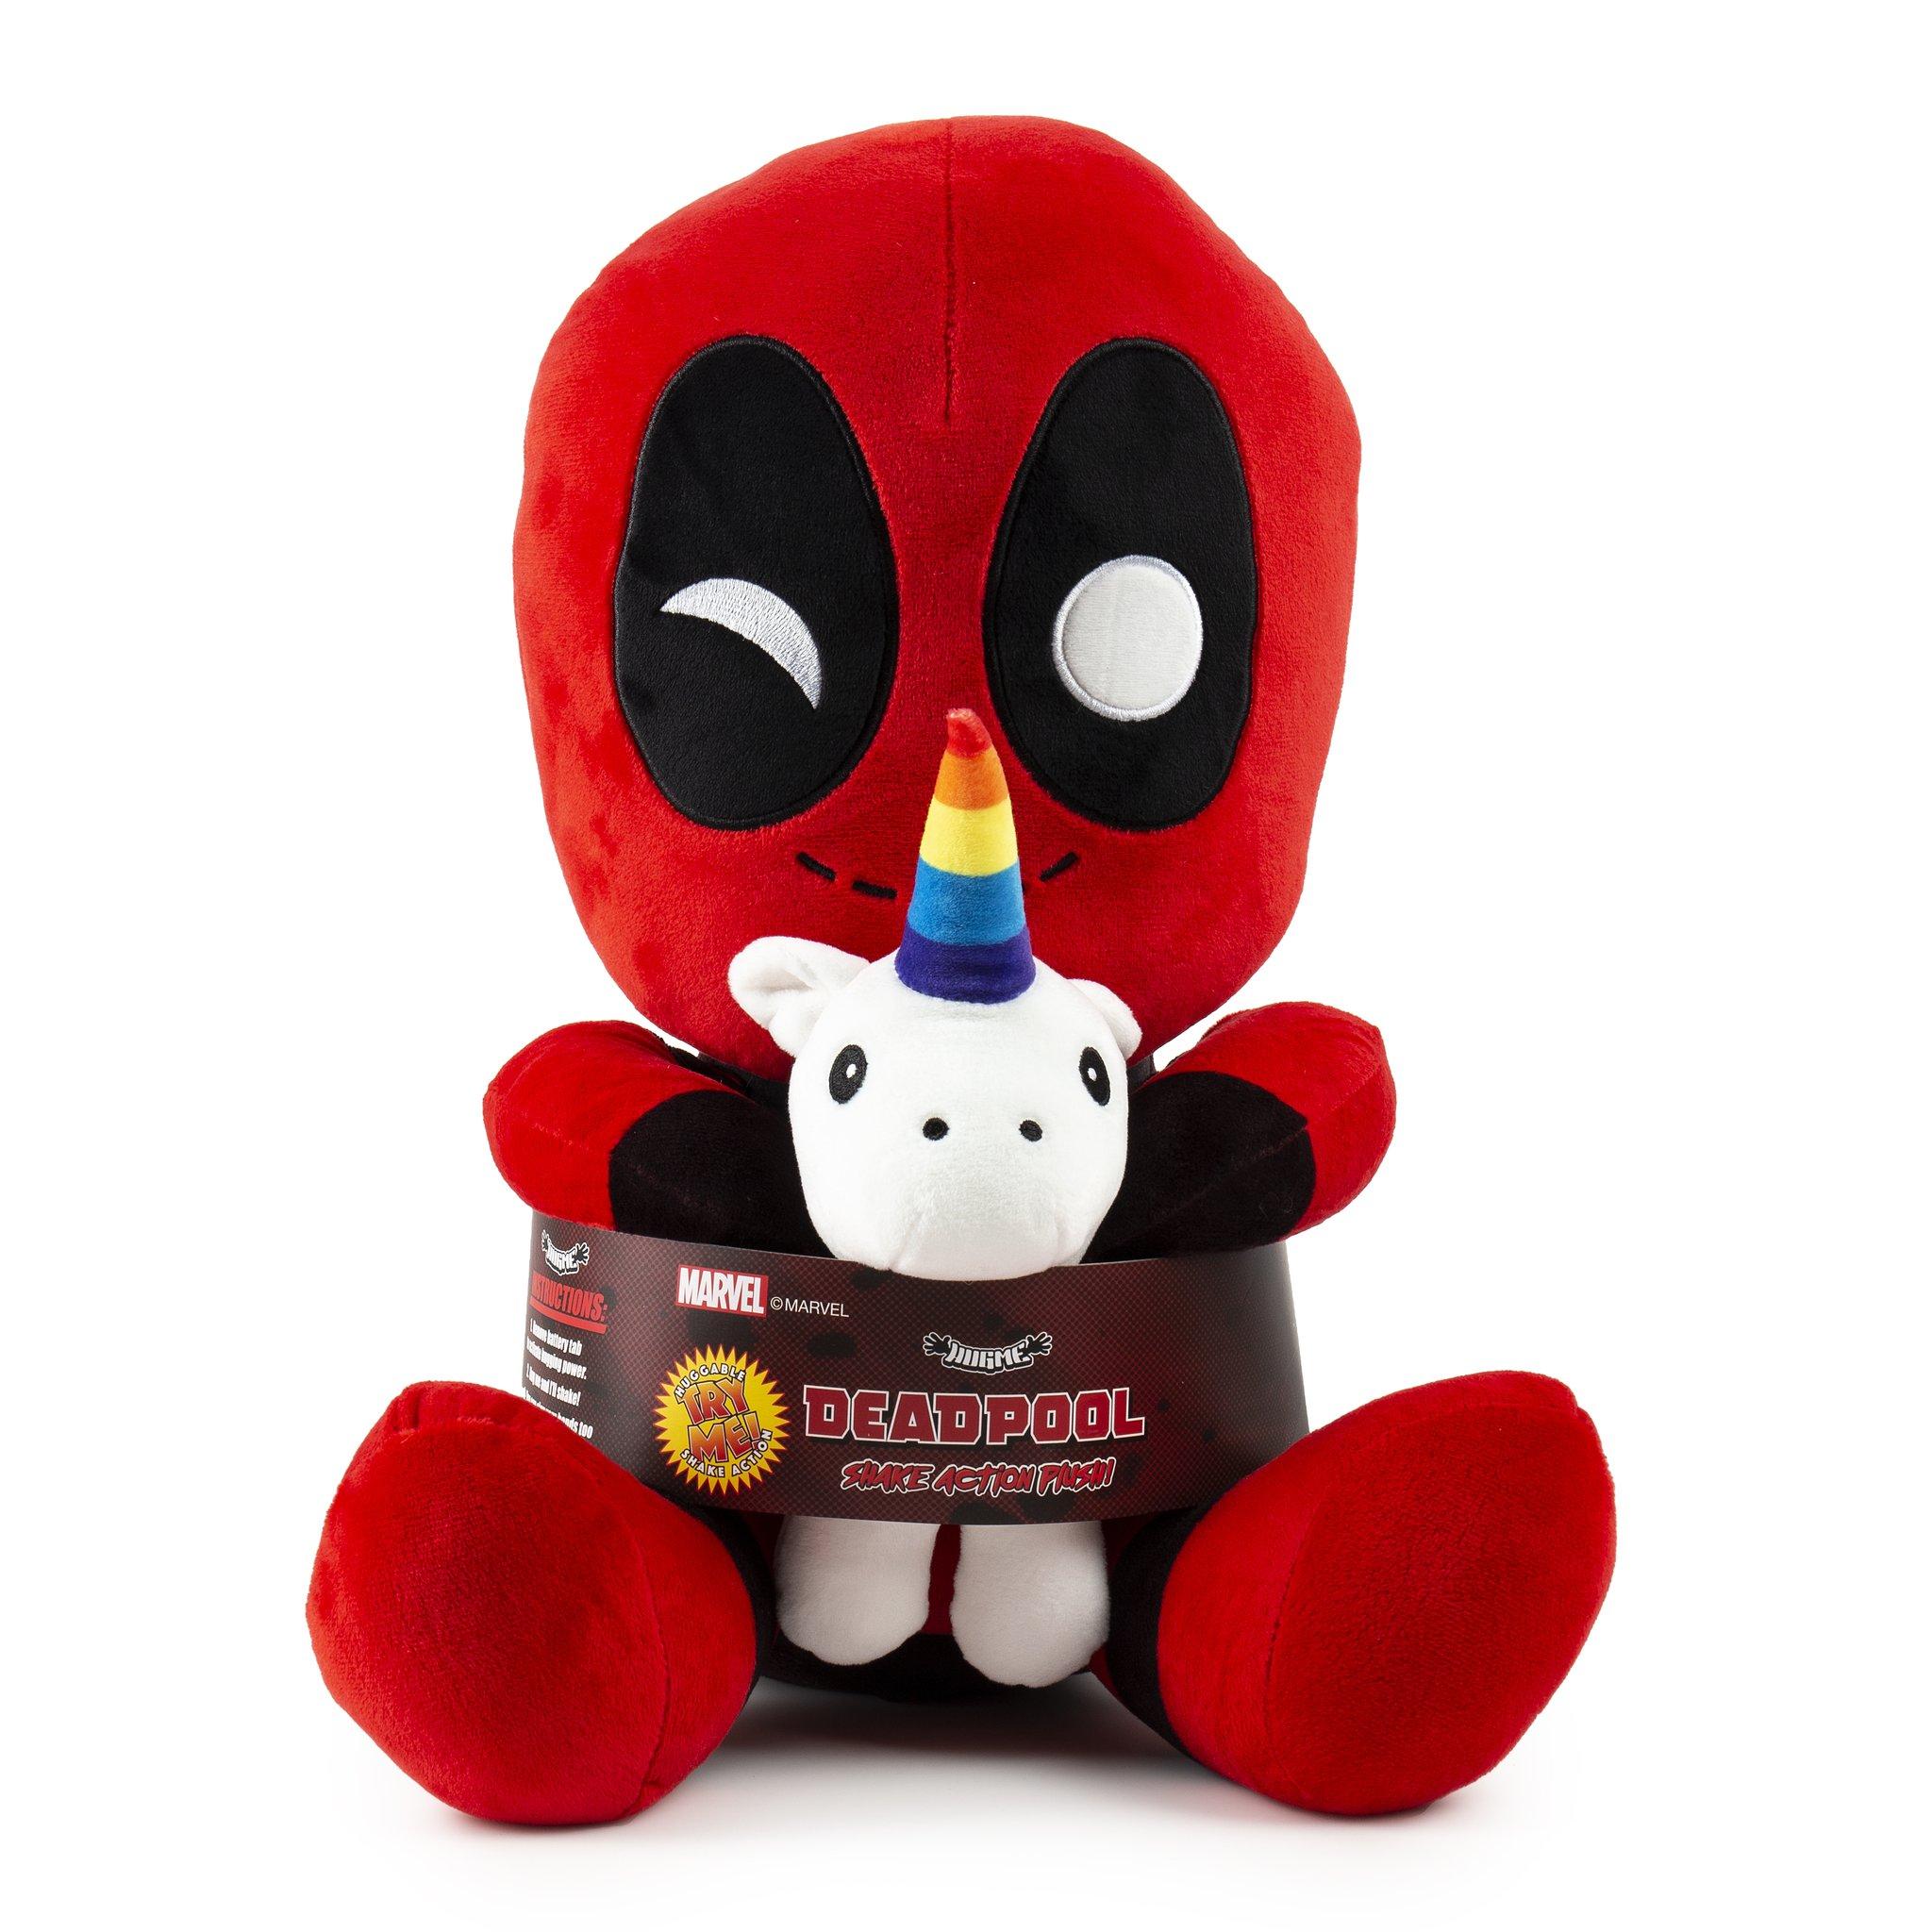 Marvel Deadpool Riding A Unicorn KidRobot HugMe Vibrating